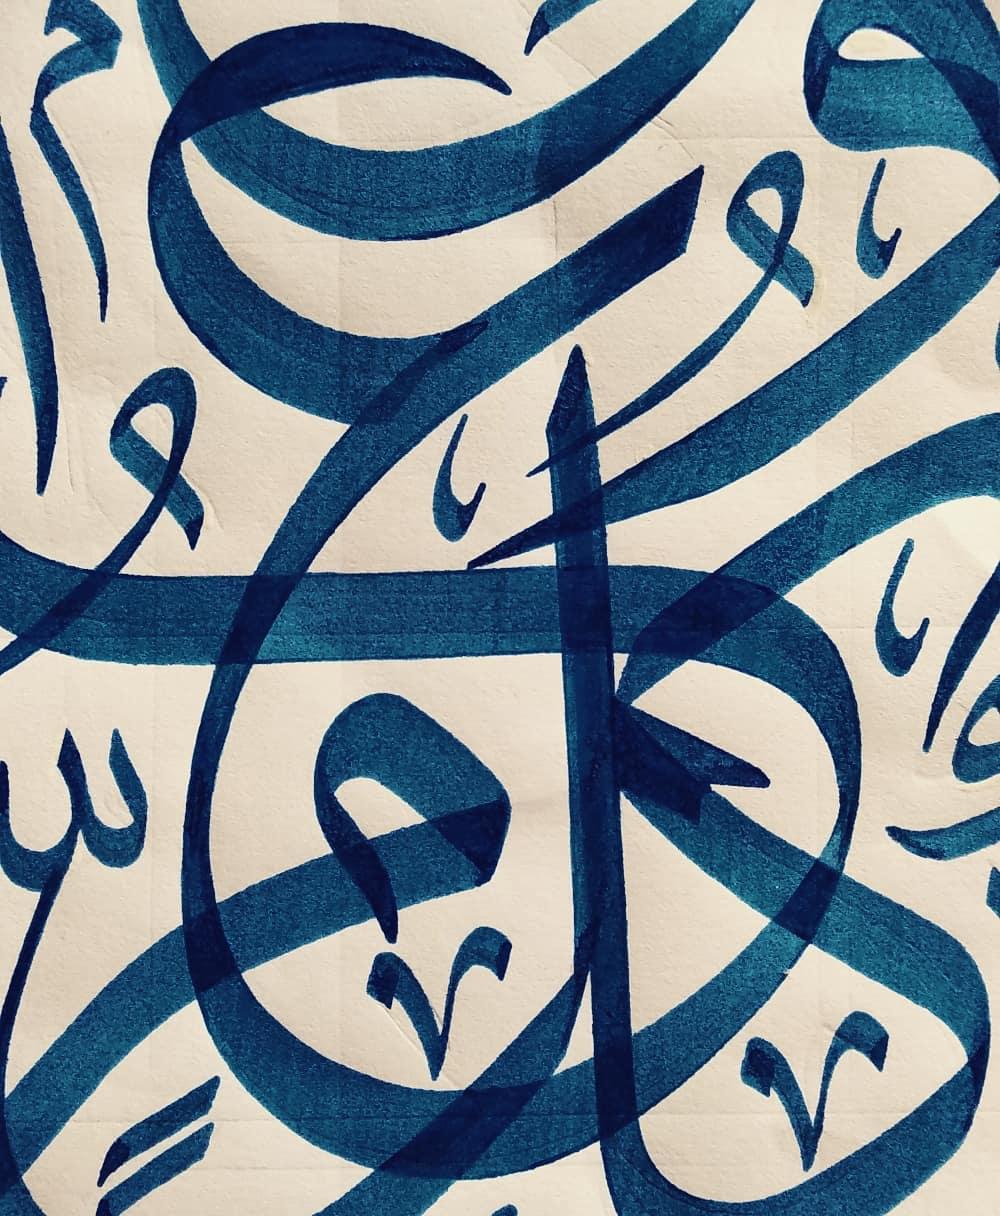 Works Calligraphy Taufik Hasibuan كل عام وانتم بخير.. 0441 هجريه… 65